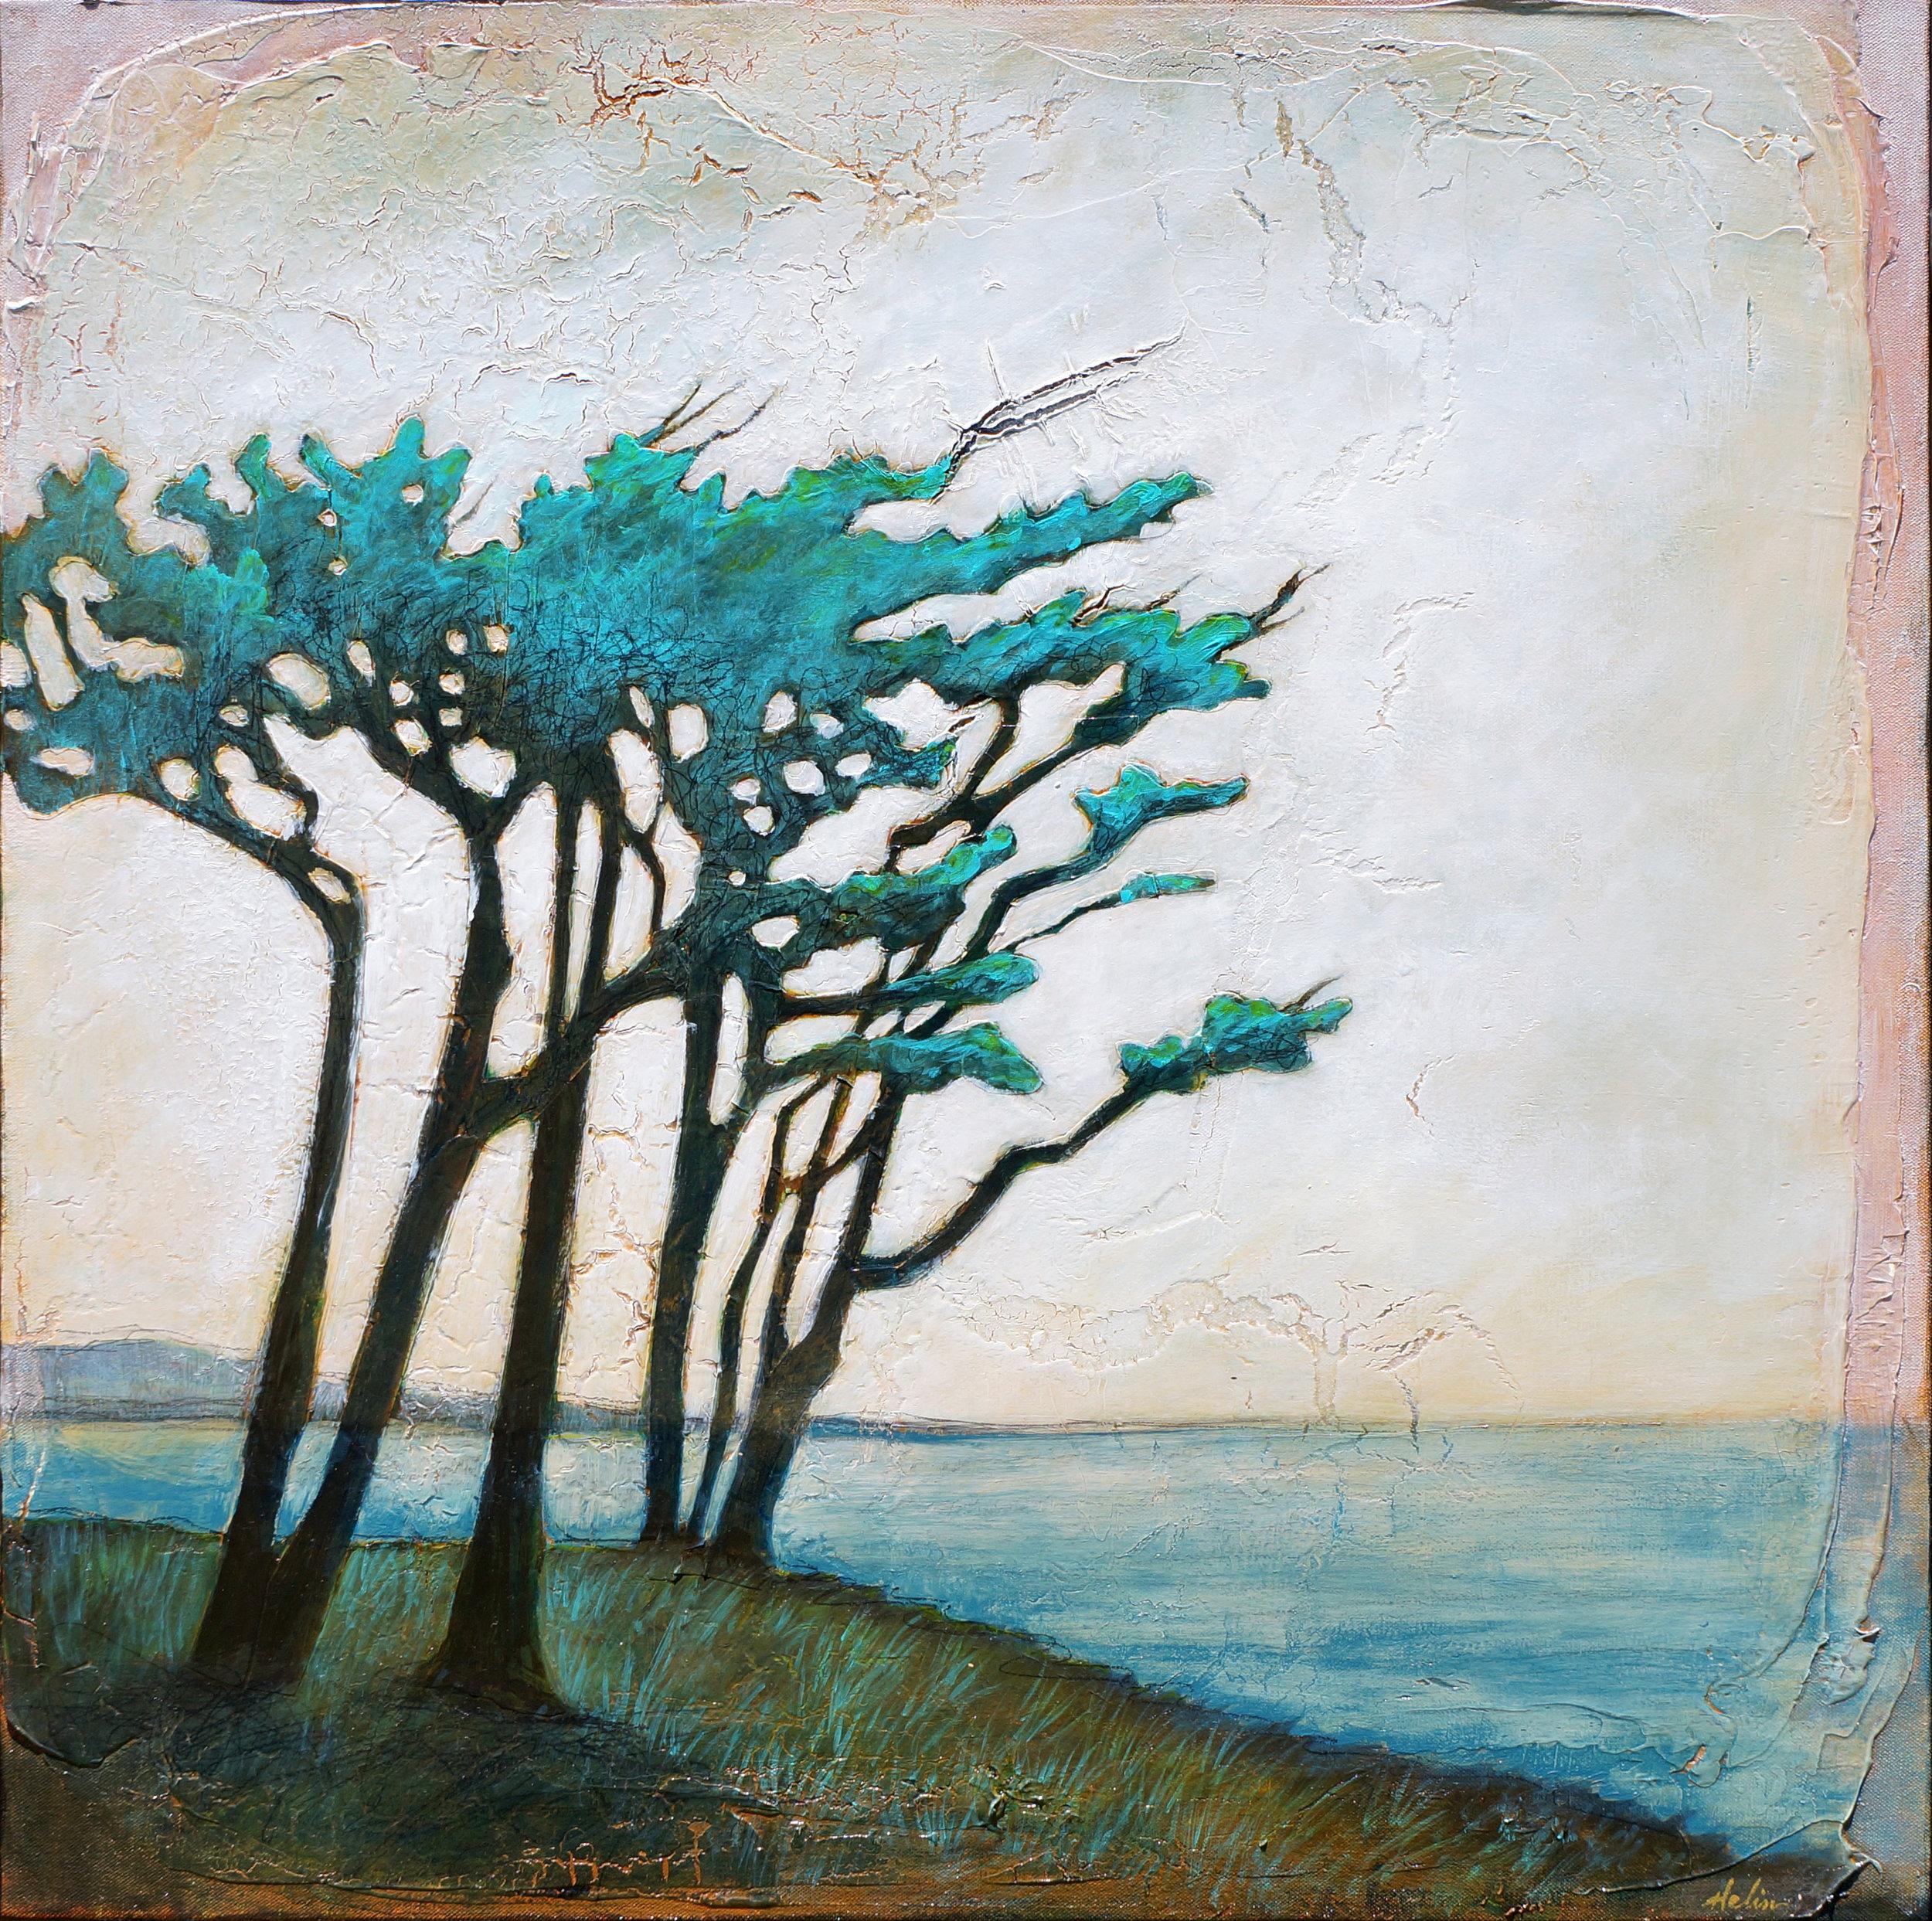 shyama_neon_cypress_painting.jpg